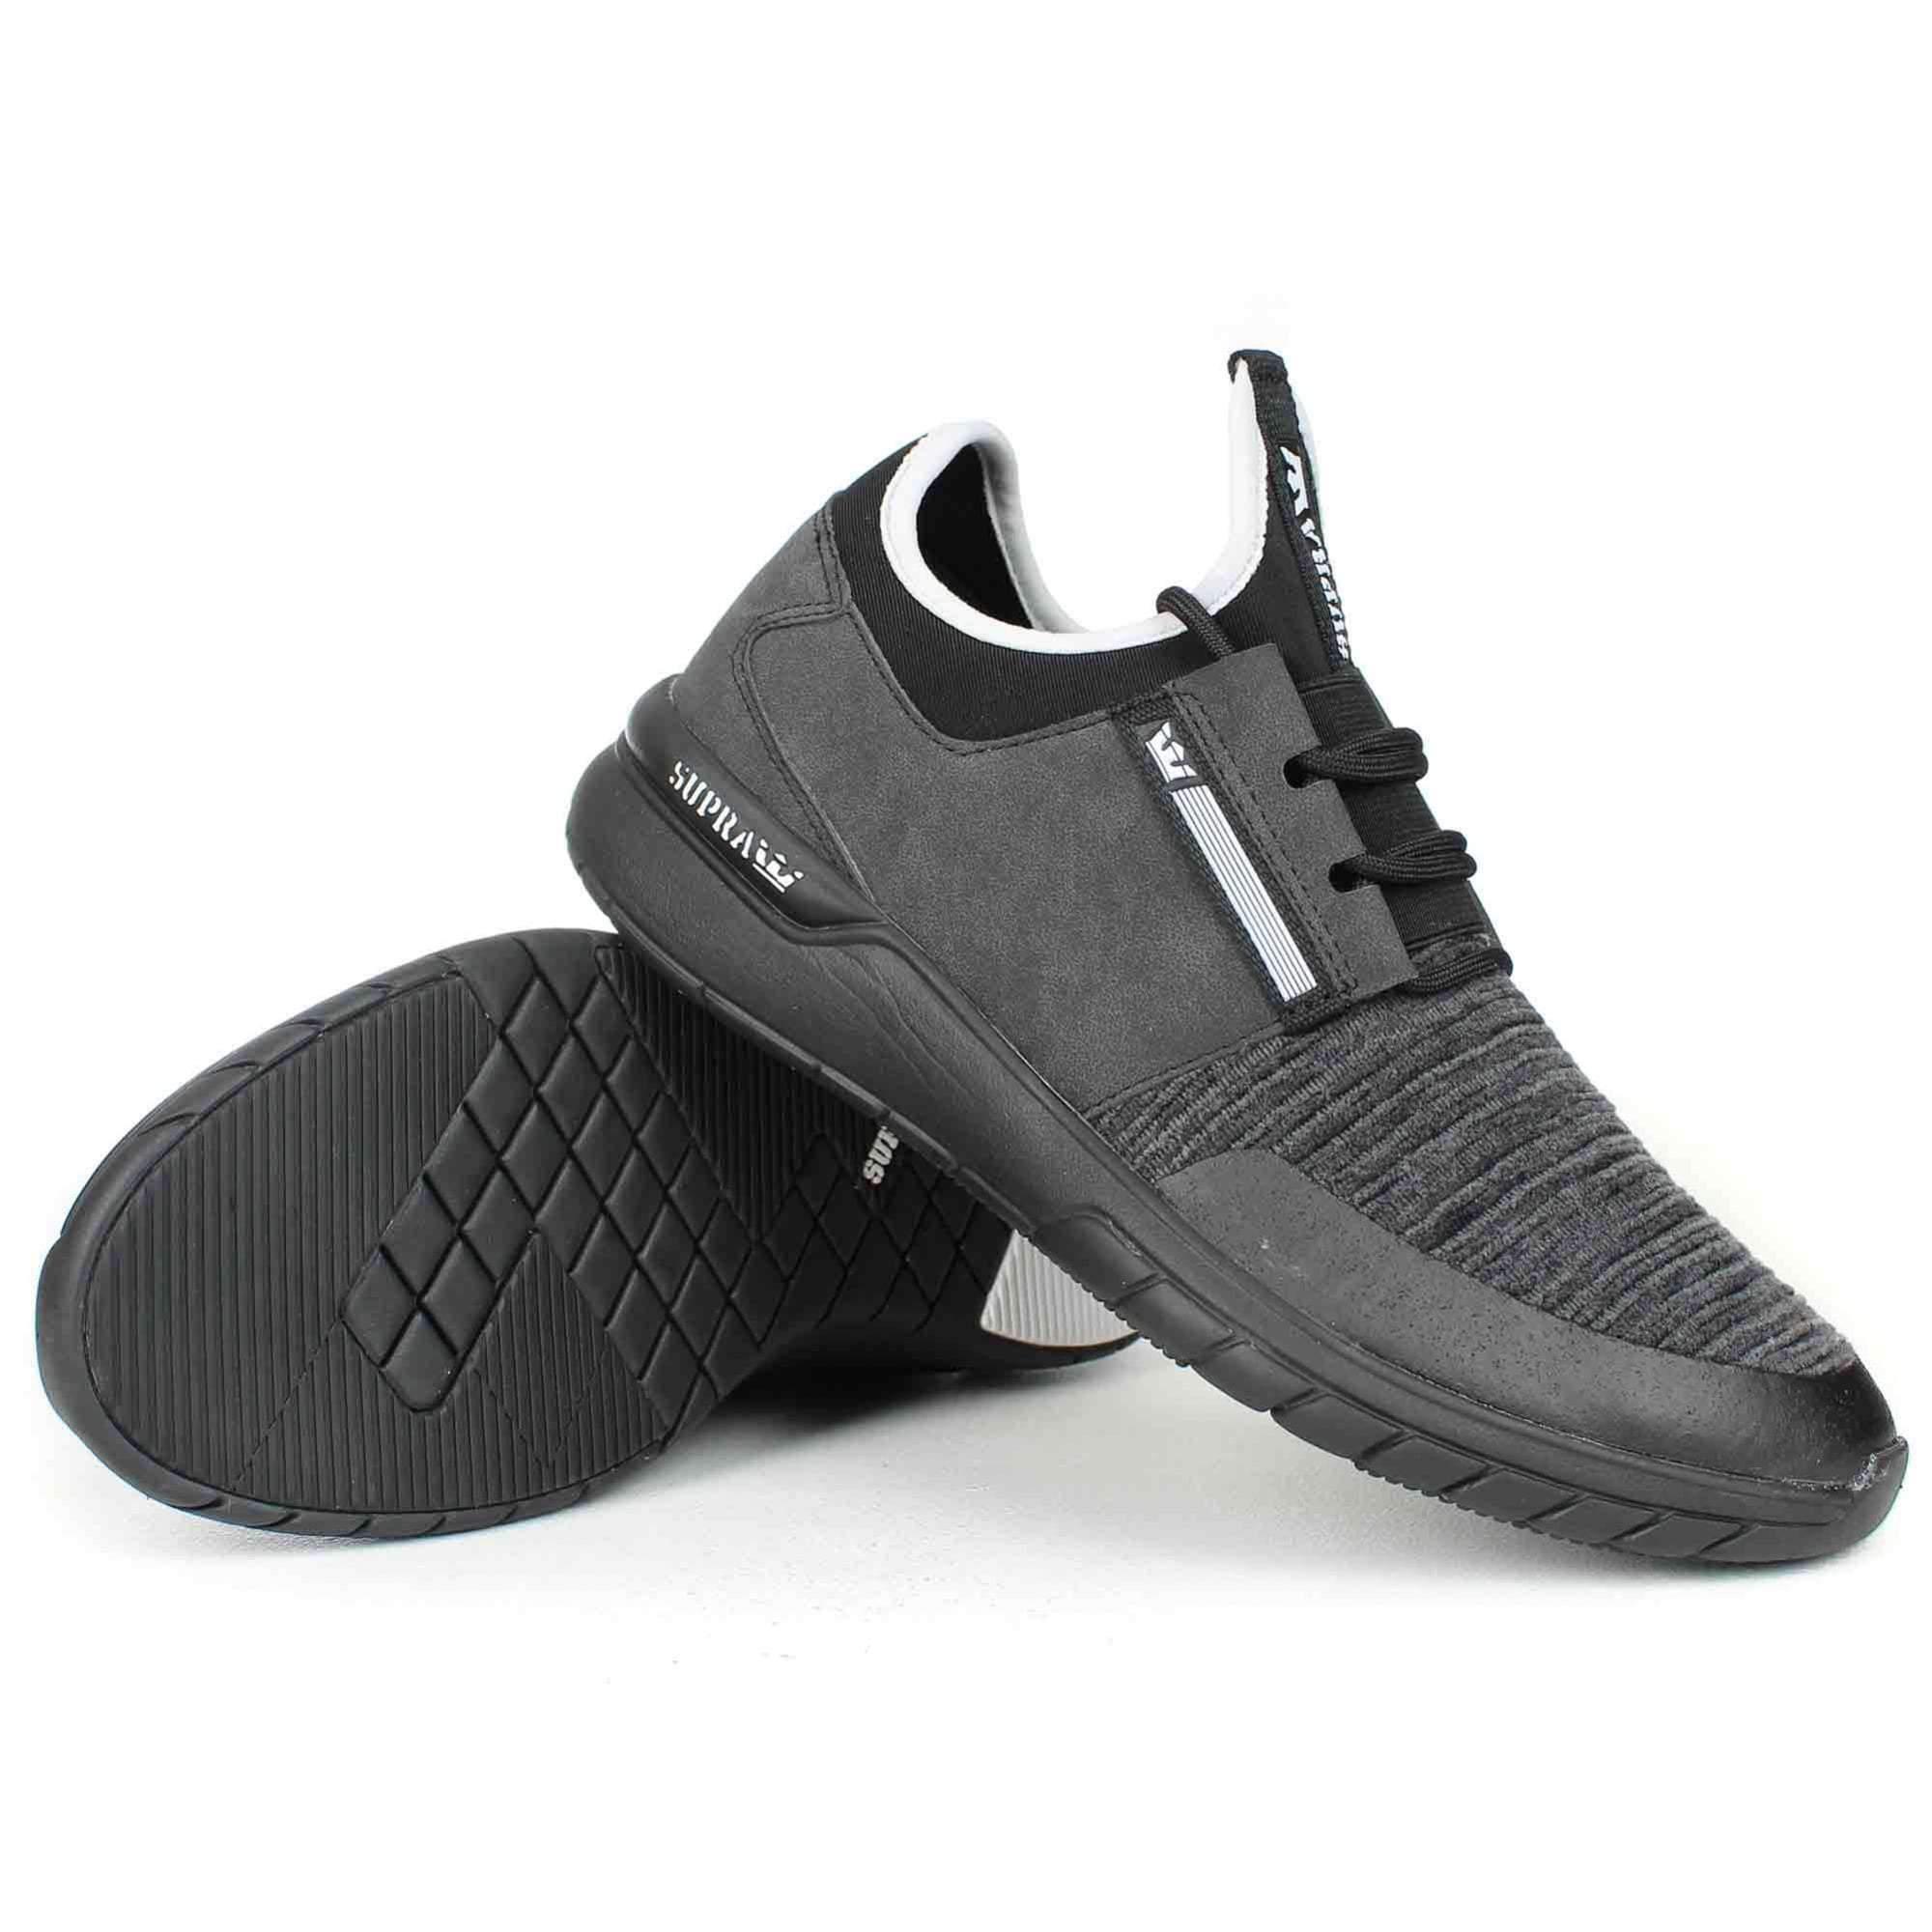 Supra shoes, Mens skate shoes, Skate shoes